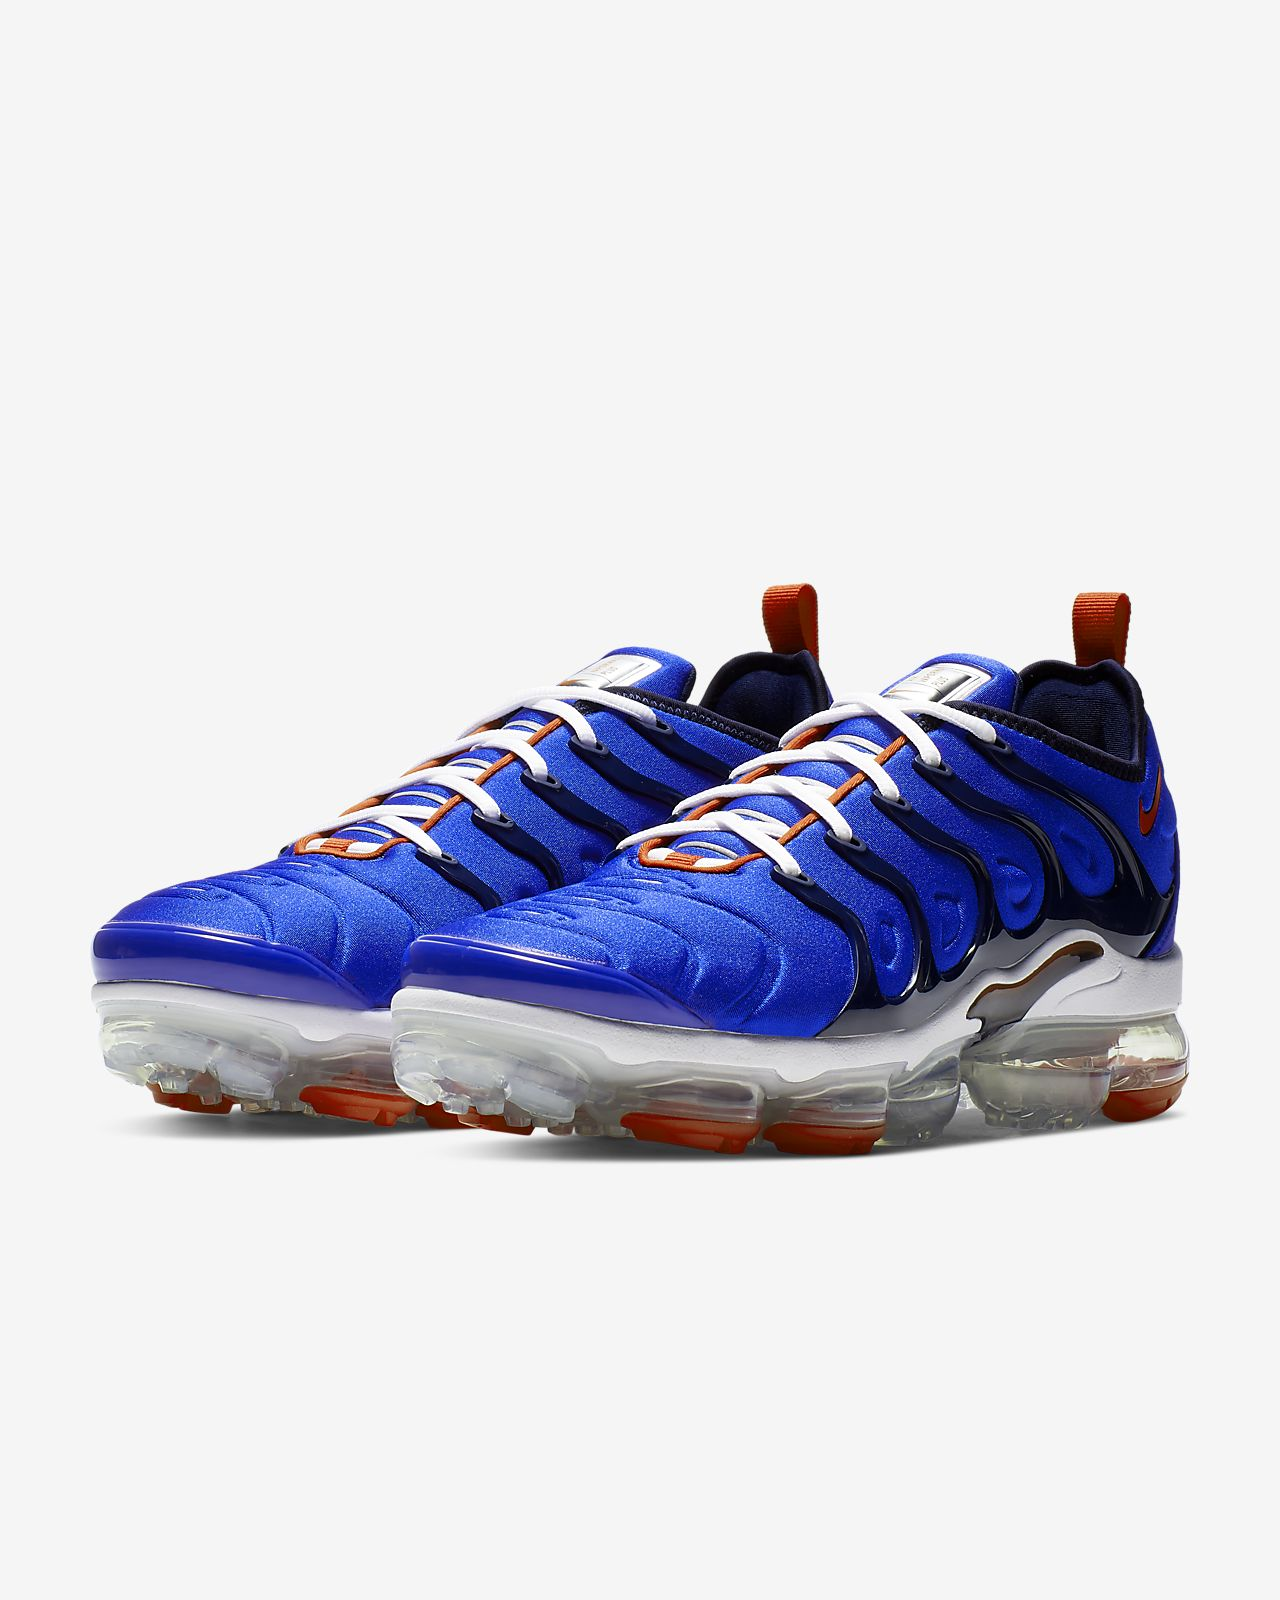 huge discount 1f25b 273b2 Nike Air VaporMax Plus Men's Shoe